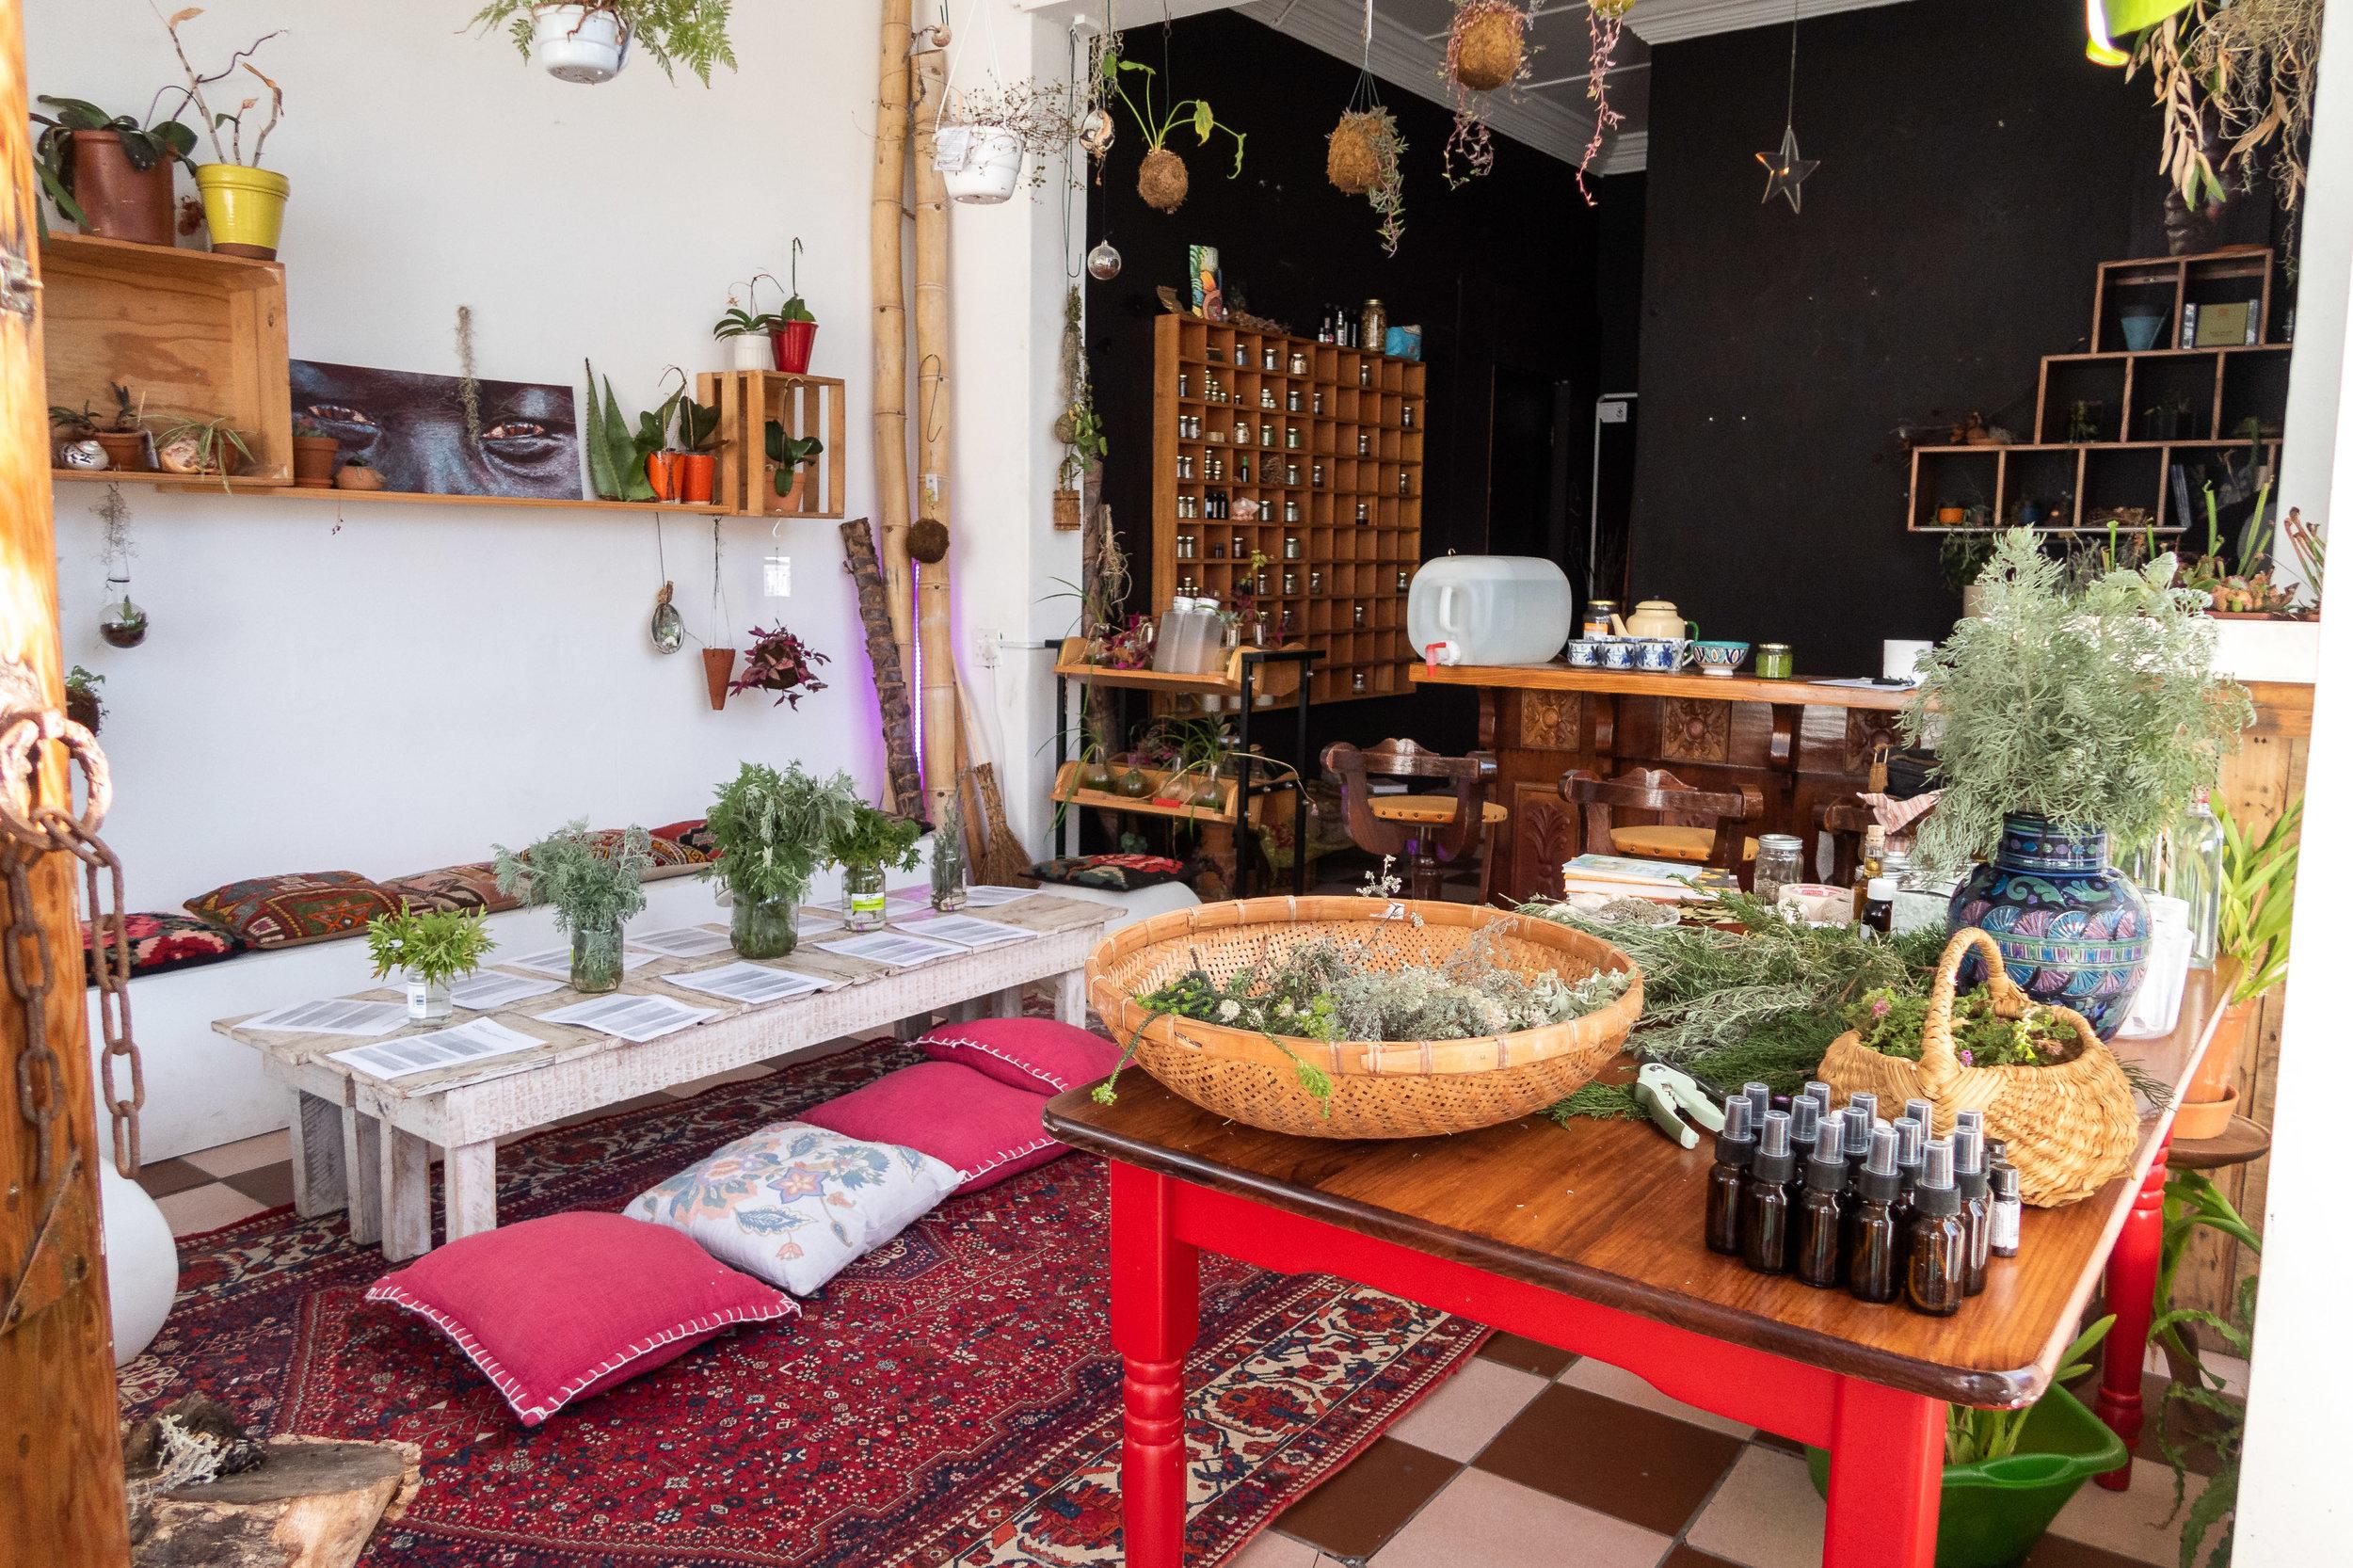 wild-love-herbalism-workshop-women-cape-town-south-africa-rewilding-003.jpg